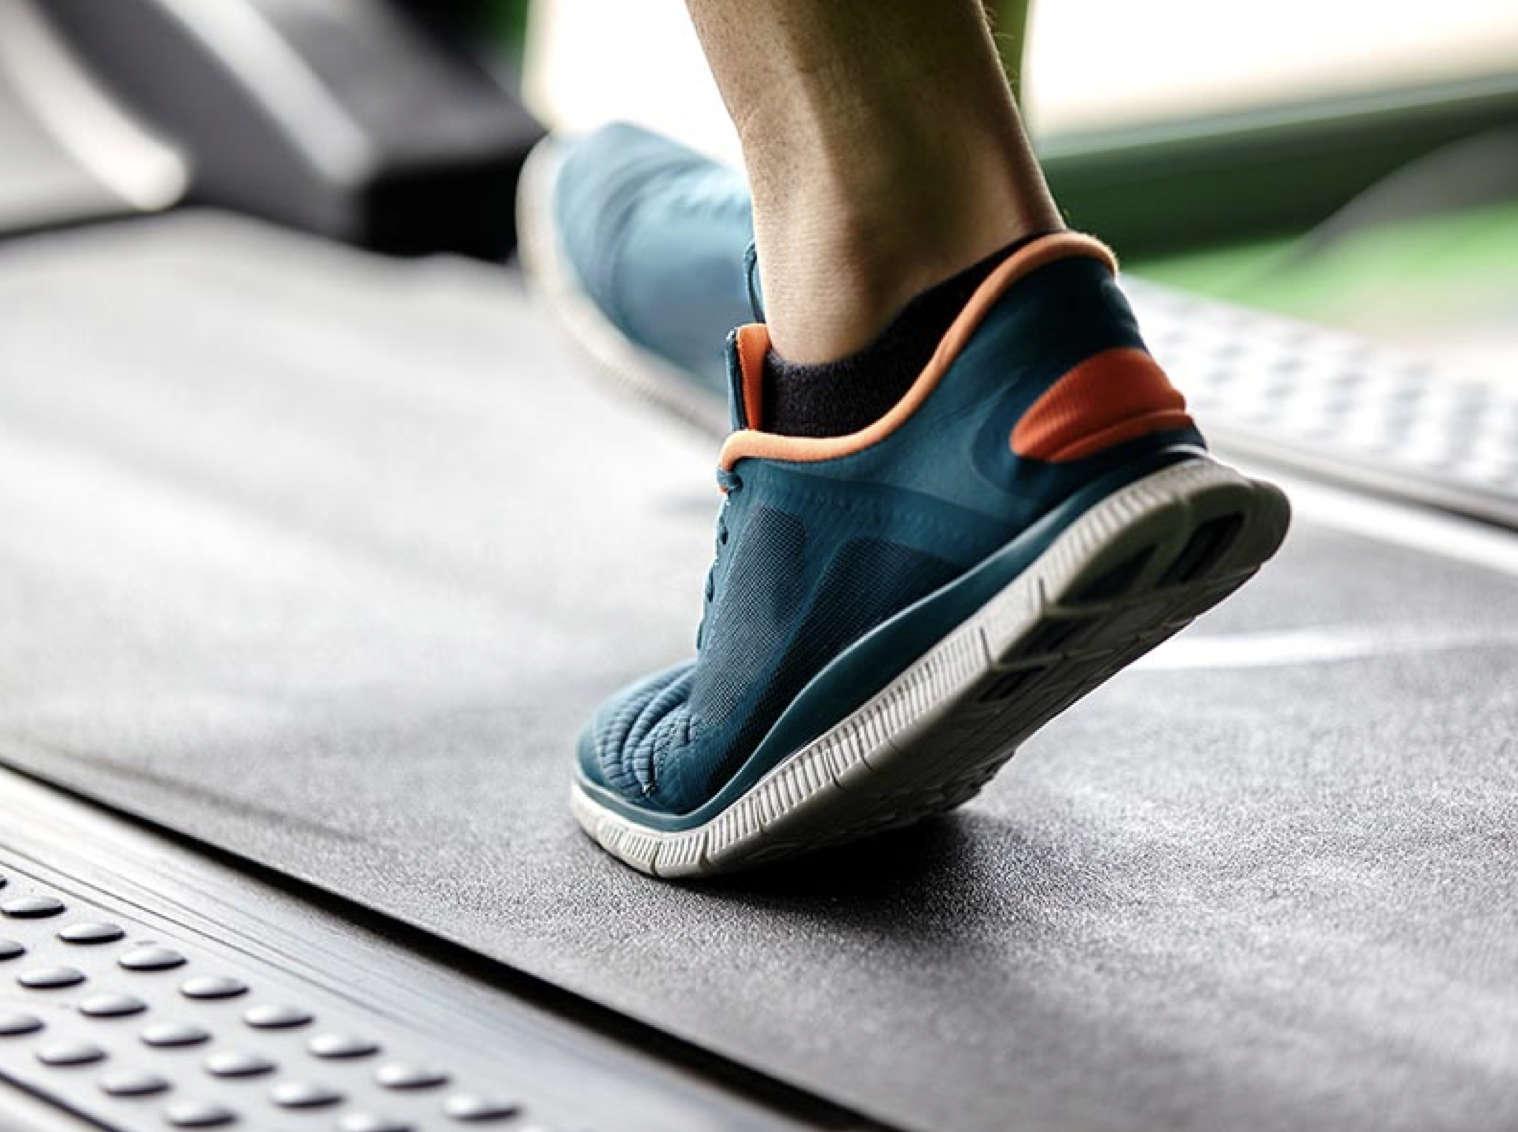 Person walking on treadmill.